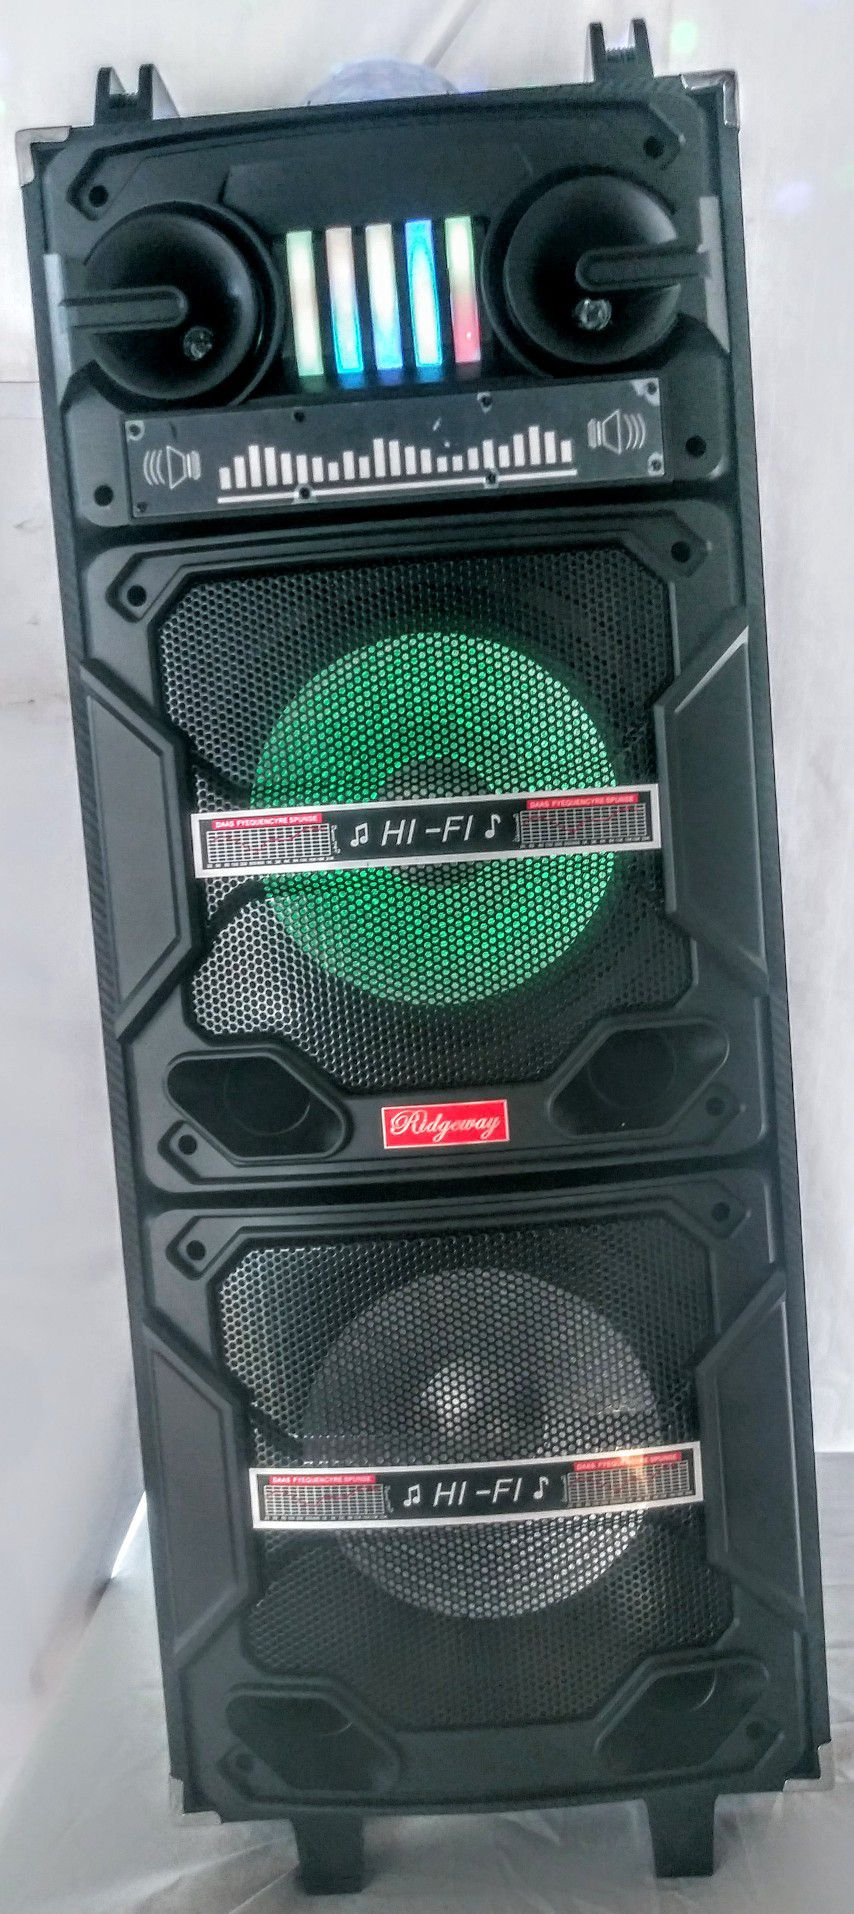 RIDGEWAY./ PORTABLE SPEAKER BLUETOOTH / FMRadio /KARAOKE /USB. TFCARD / MP3 CONTROL REMOTE /  🎤 MICROPHONE INC. (4000W) BATTERY RECARGABLE ( each.